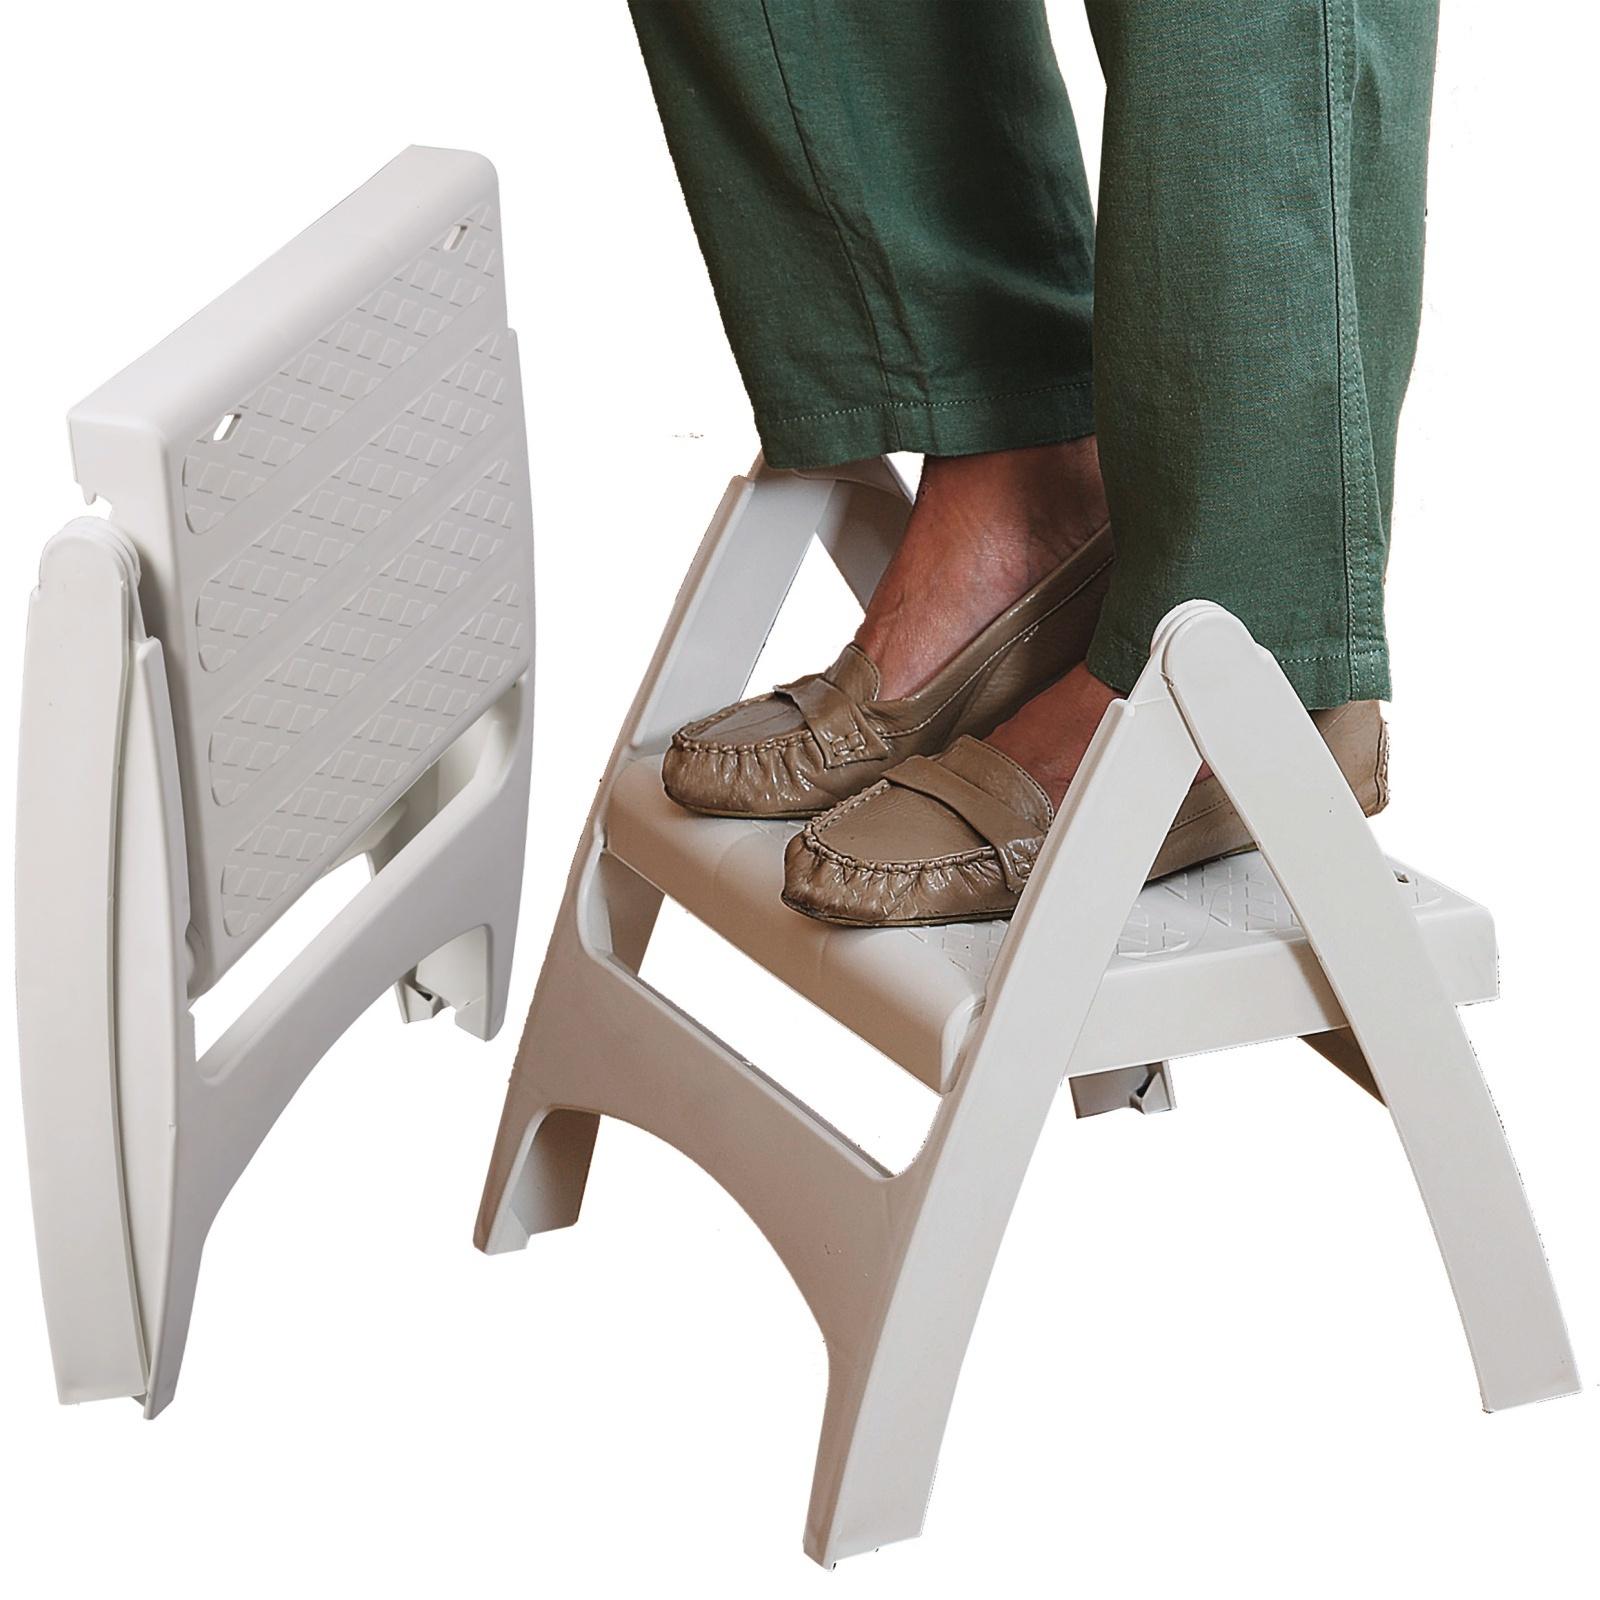 Swell Details About Portable Folding Step Stool Anti Slip Folds Flat Lightweight 120Kg Capacity Evergreenethics Interior Chair Design Evergreenethicsorg